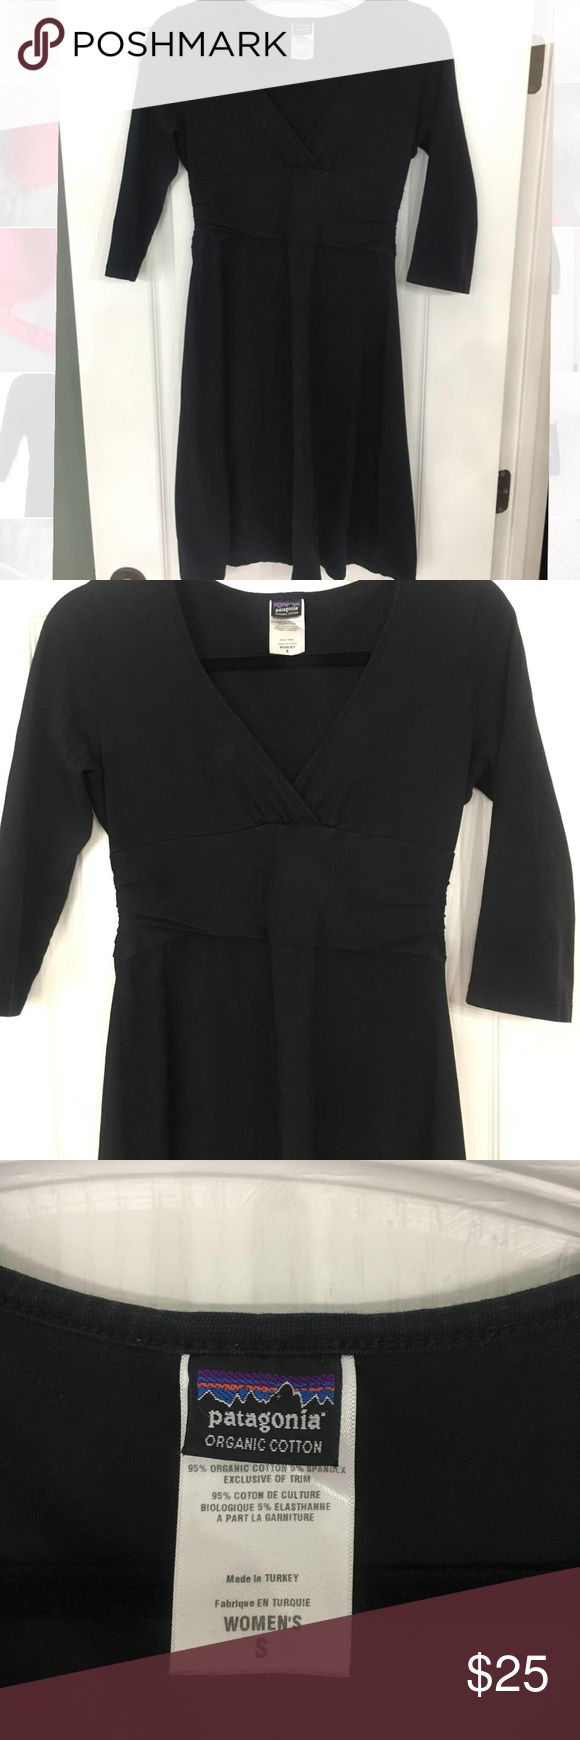 PATAGONIA DRESS✨ Black.size small Patagonia  Black vneck dress 3/4 sleeves Cotton Super comfy Patagonia Dresses